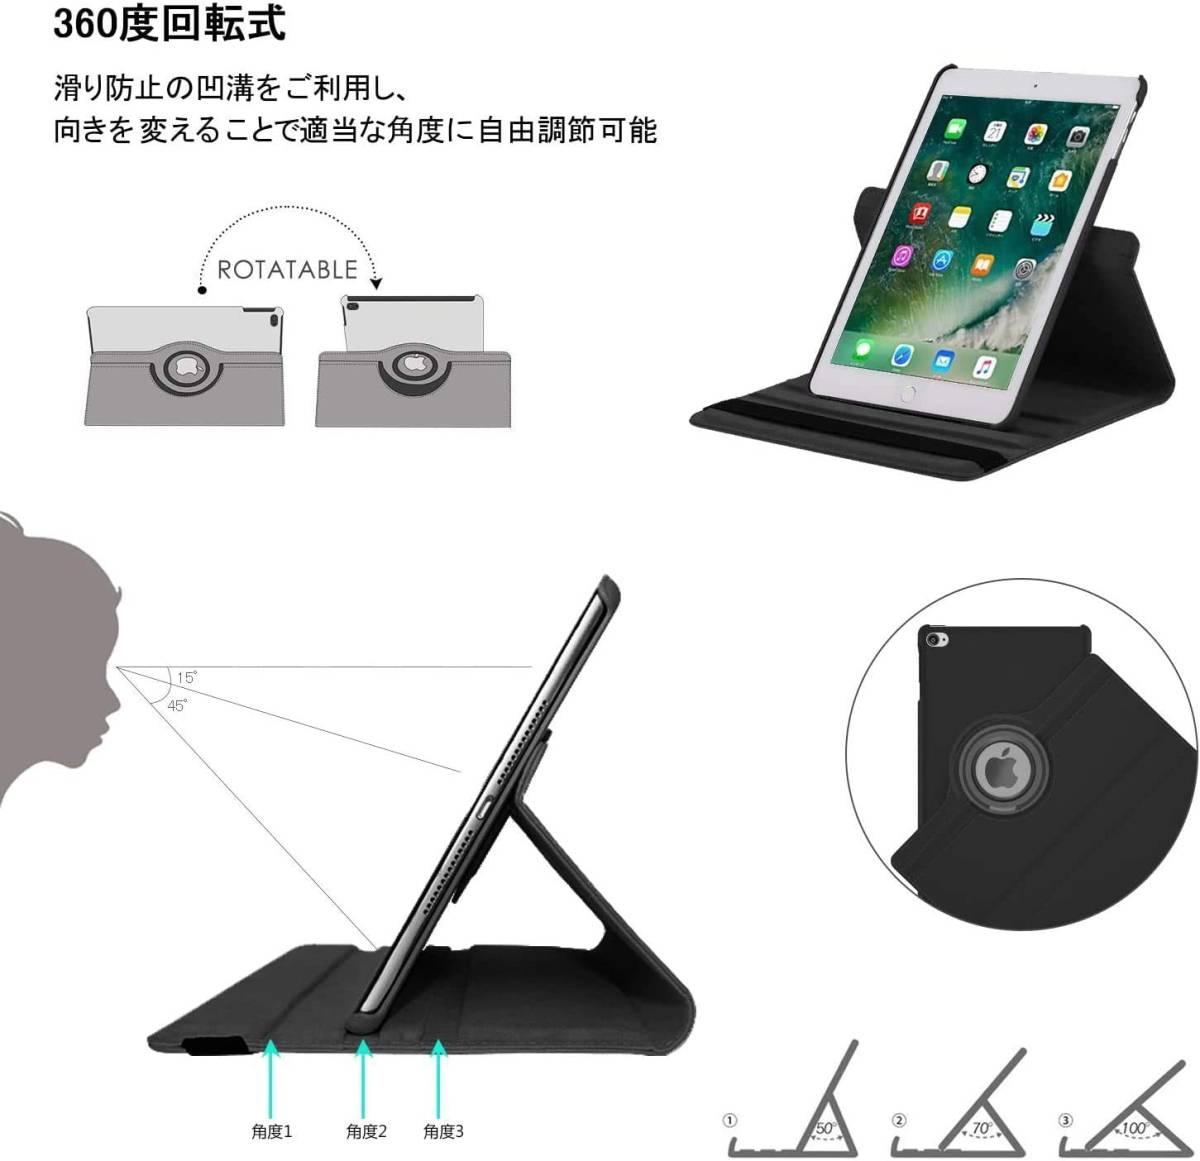 iPad Air 2019年型 10.5インチ ケース (黒) iPad Pro 2017年型 合革レザー 360回転 スタンドケース 耐衝撃 多角度 アイパッド保護カバー_画像1